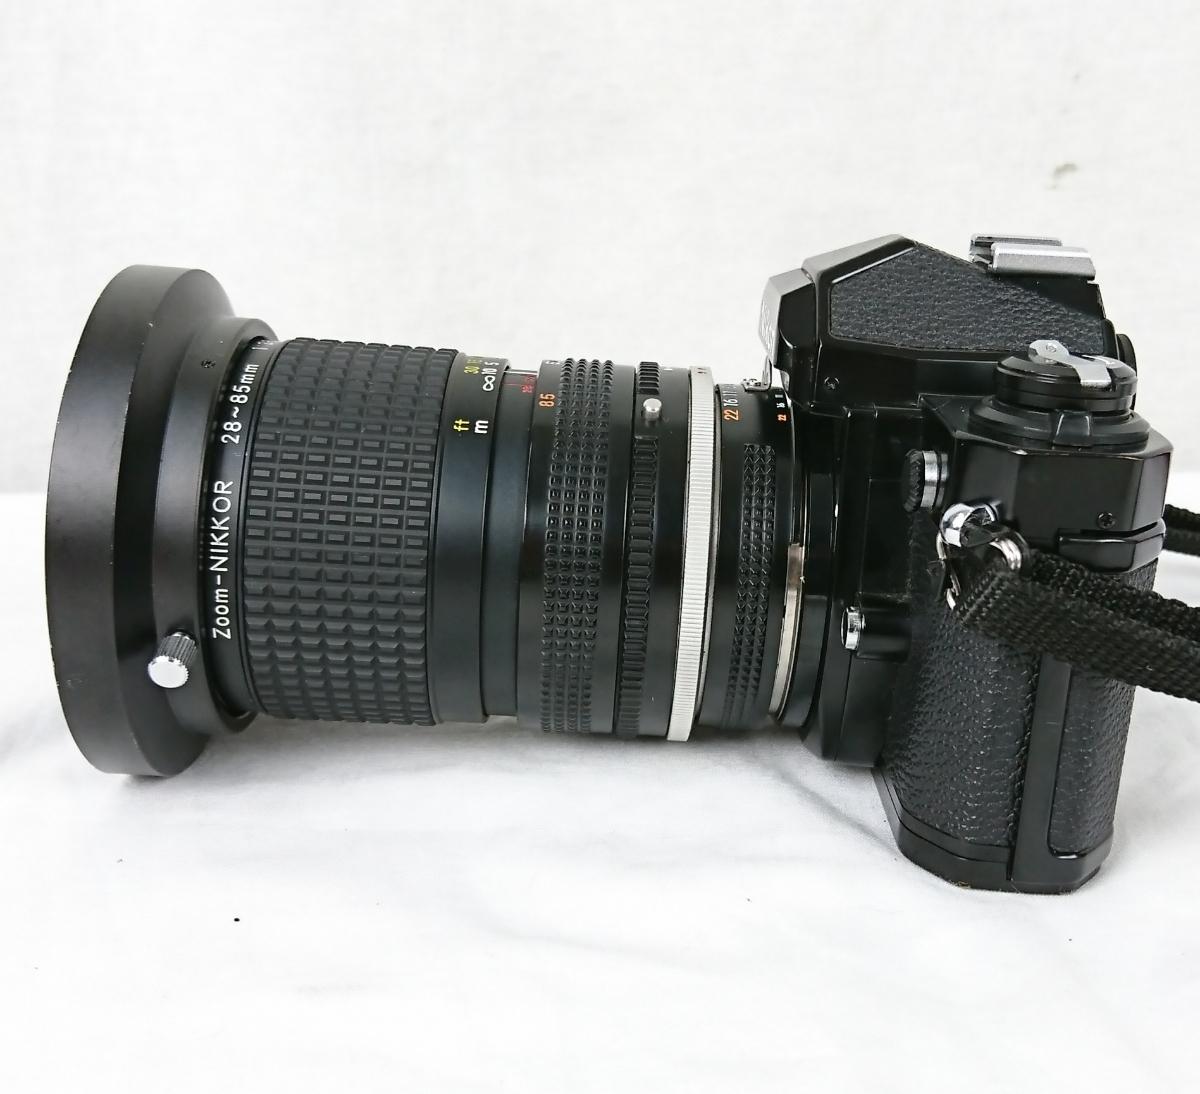 【GK-201】 Nikon ニコン カメラ FM2 レンズ Zoom-NIKKOR 28~85mm 1:3.5~4.5 黒色 black ブラックボディー N7763716 MFカメラ _画像5